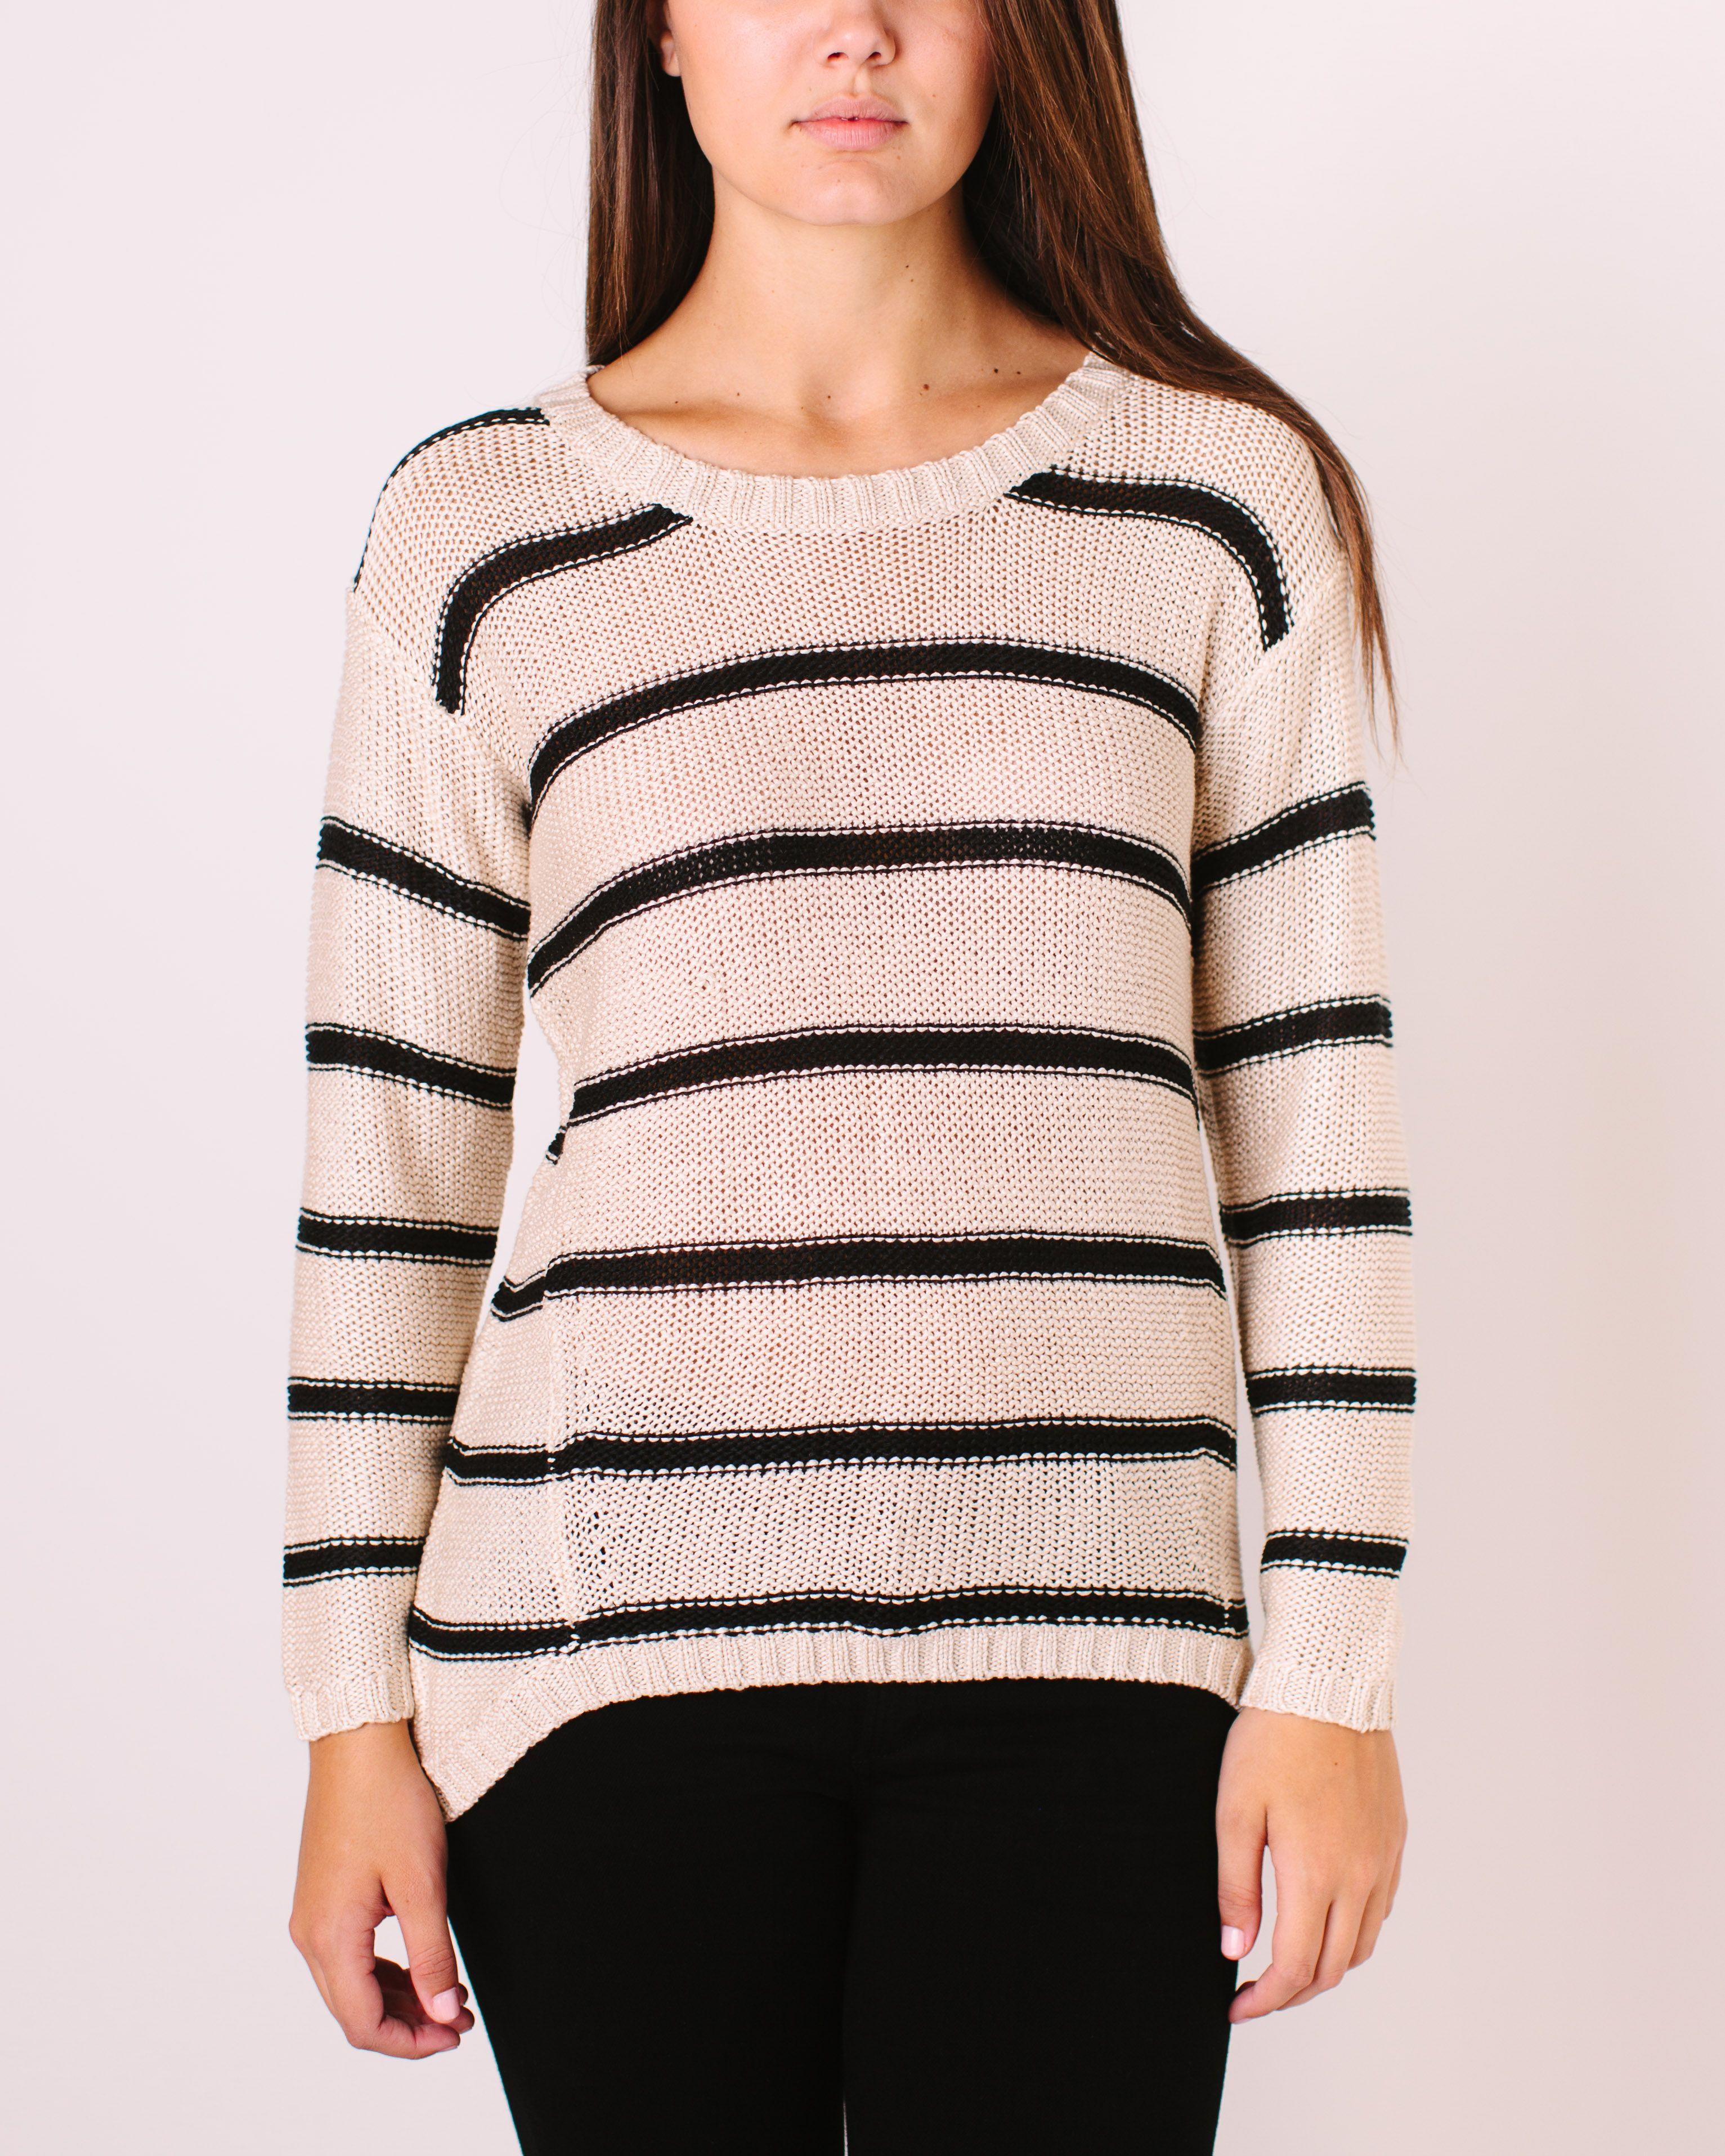 Winona Knitted Sweater- Ivory/Black